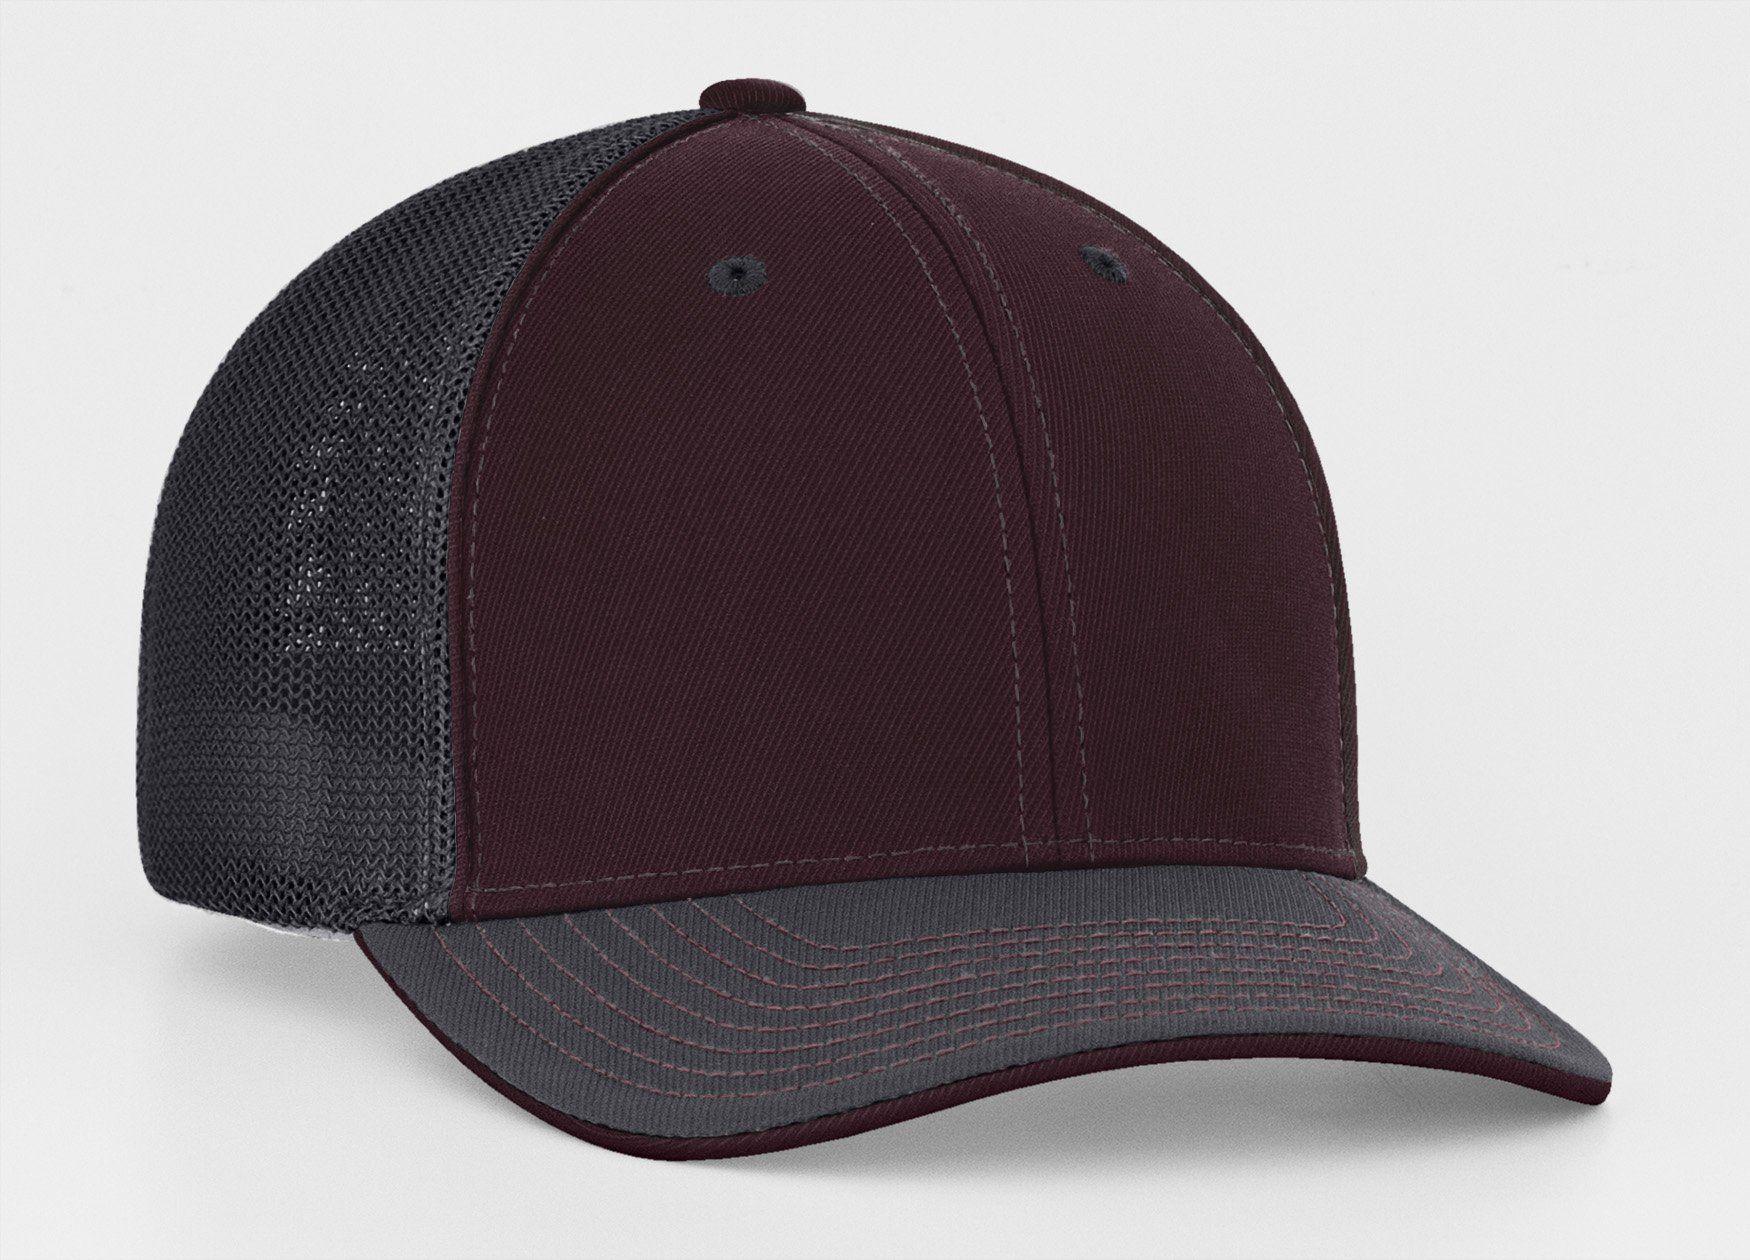 Graphite maroon mesh trucker hat hats mesh blank hats